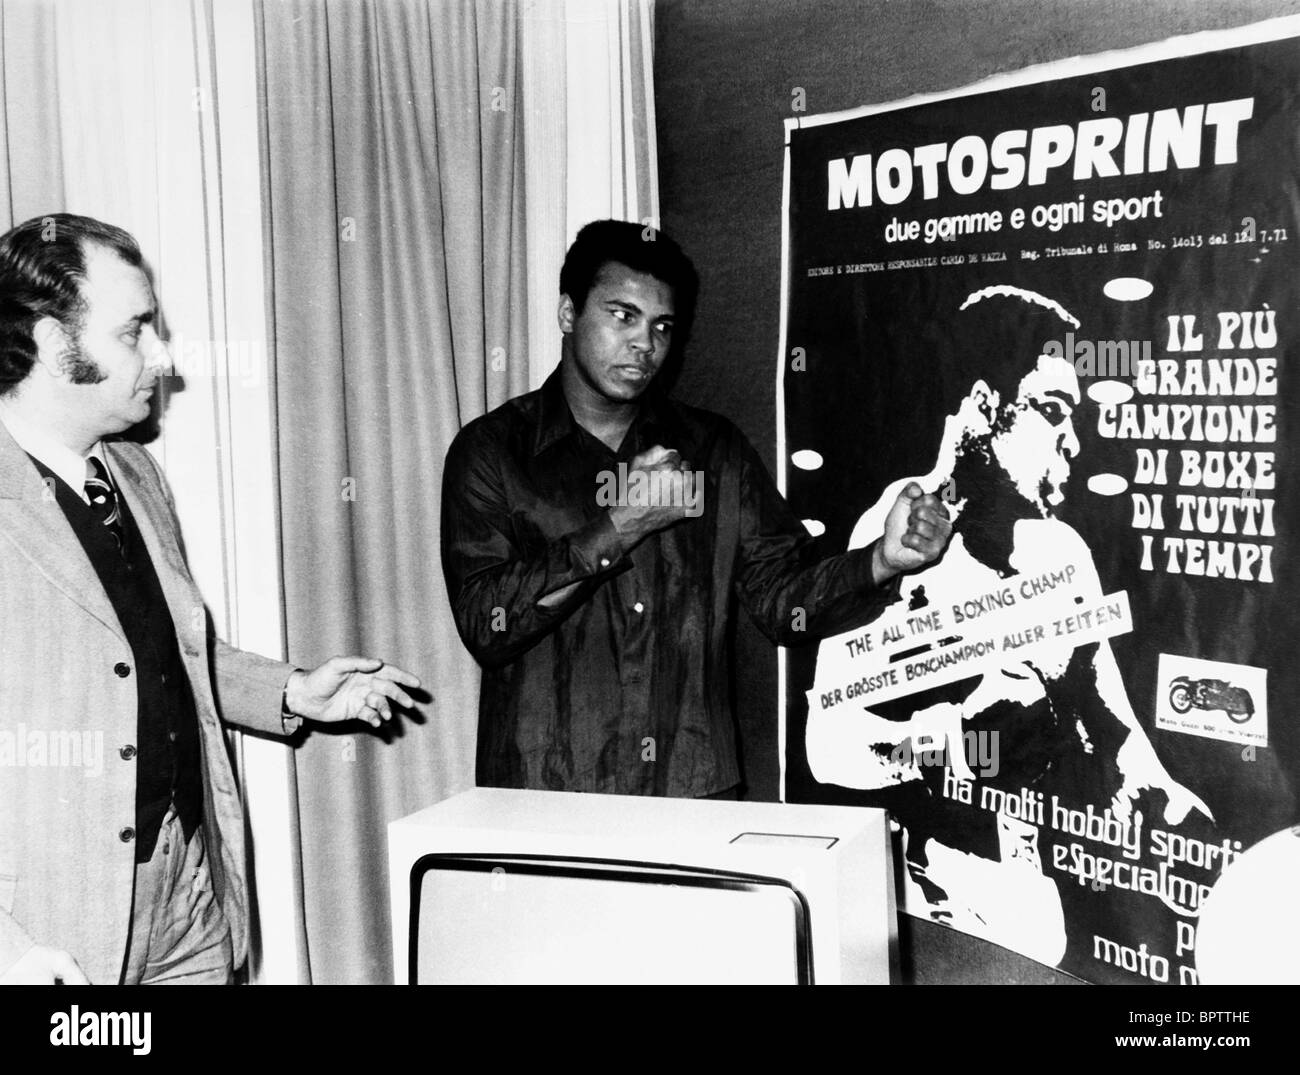 MUHAMMAD ALI HEAVYWEIGHT BOXER (1971) - Stock Image